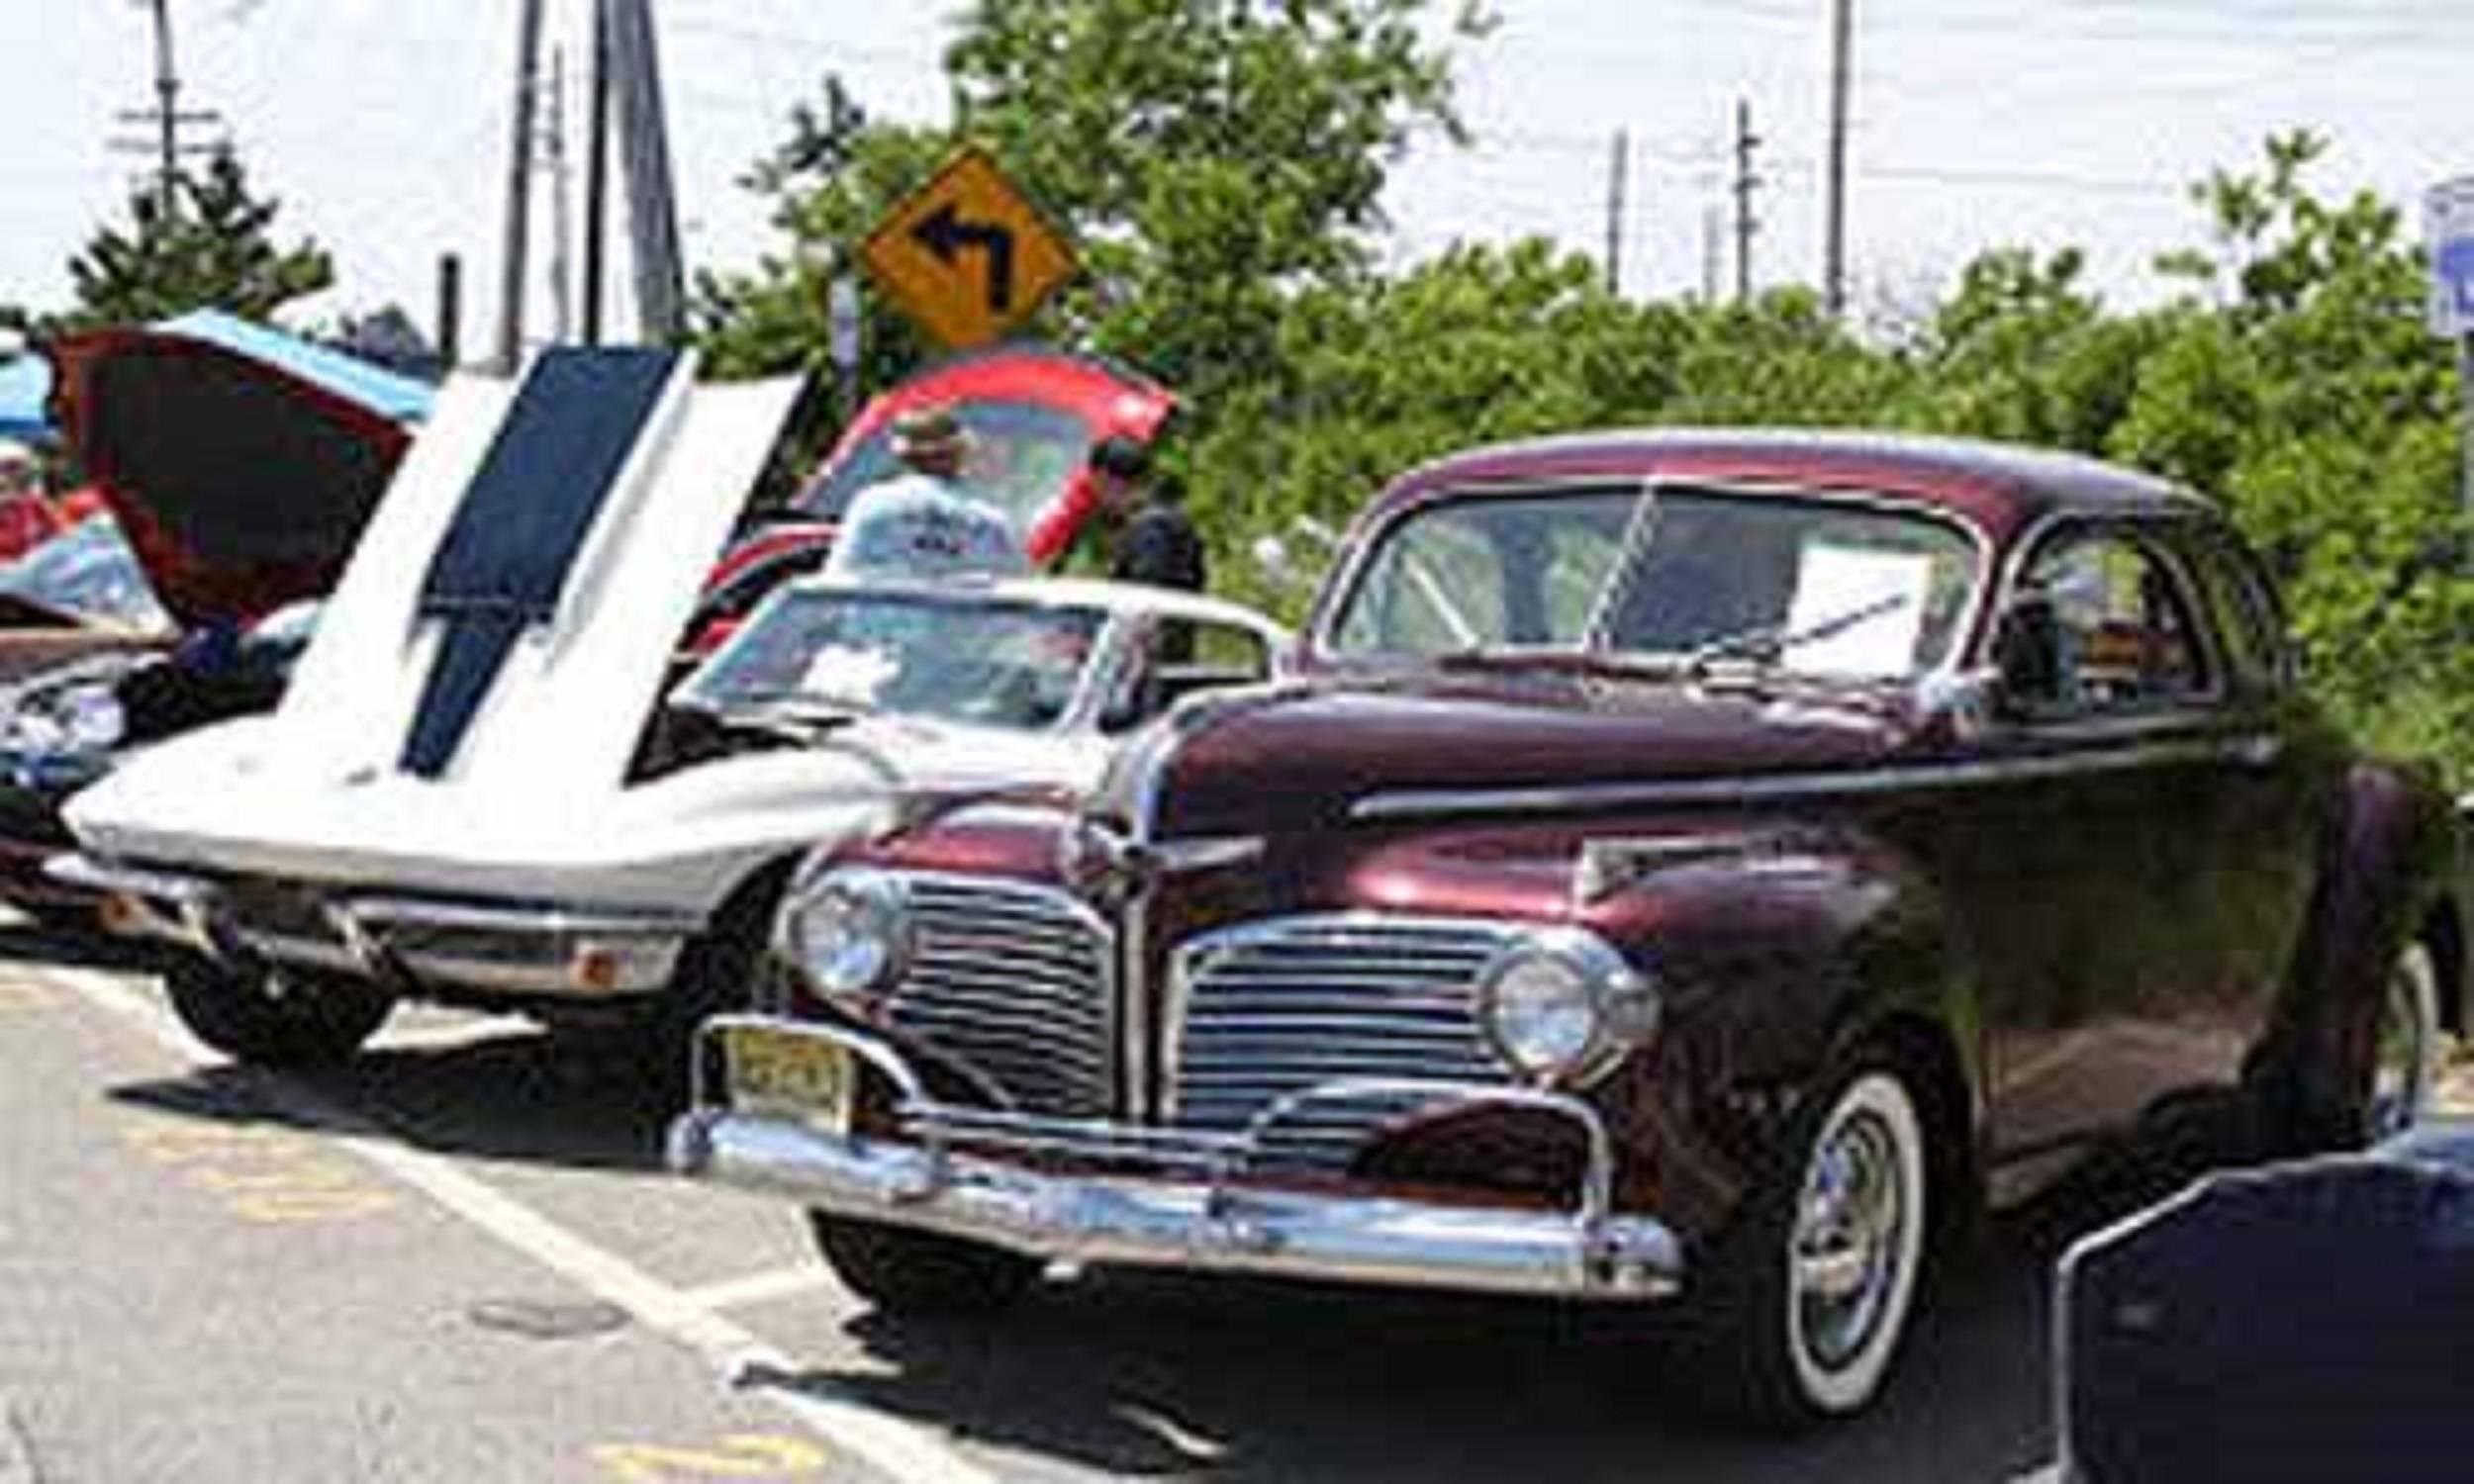 76697c6f5ad0a39e662c_vintage-car.jpg